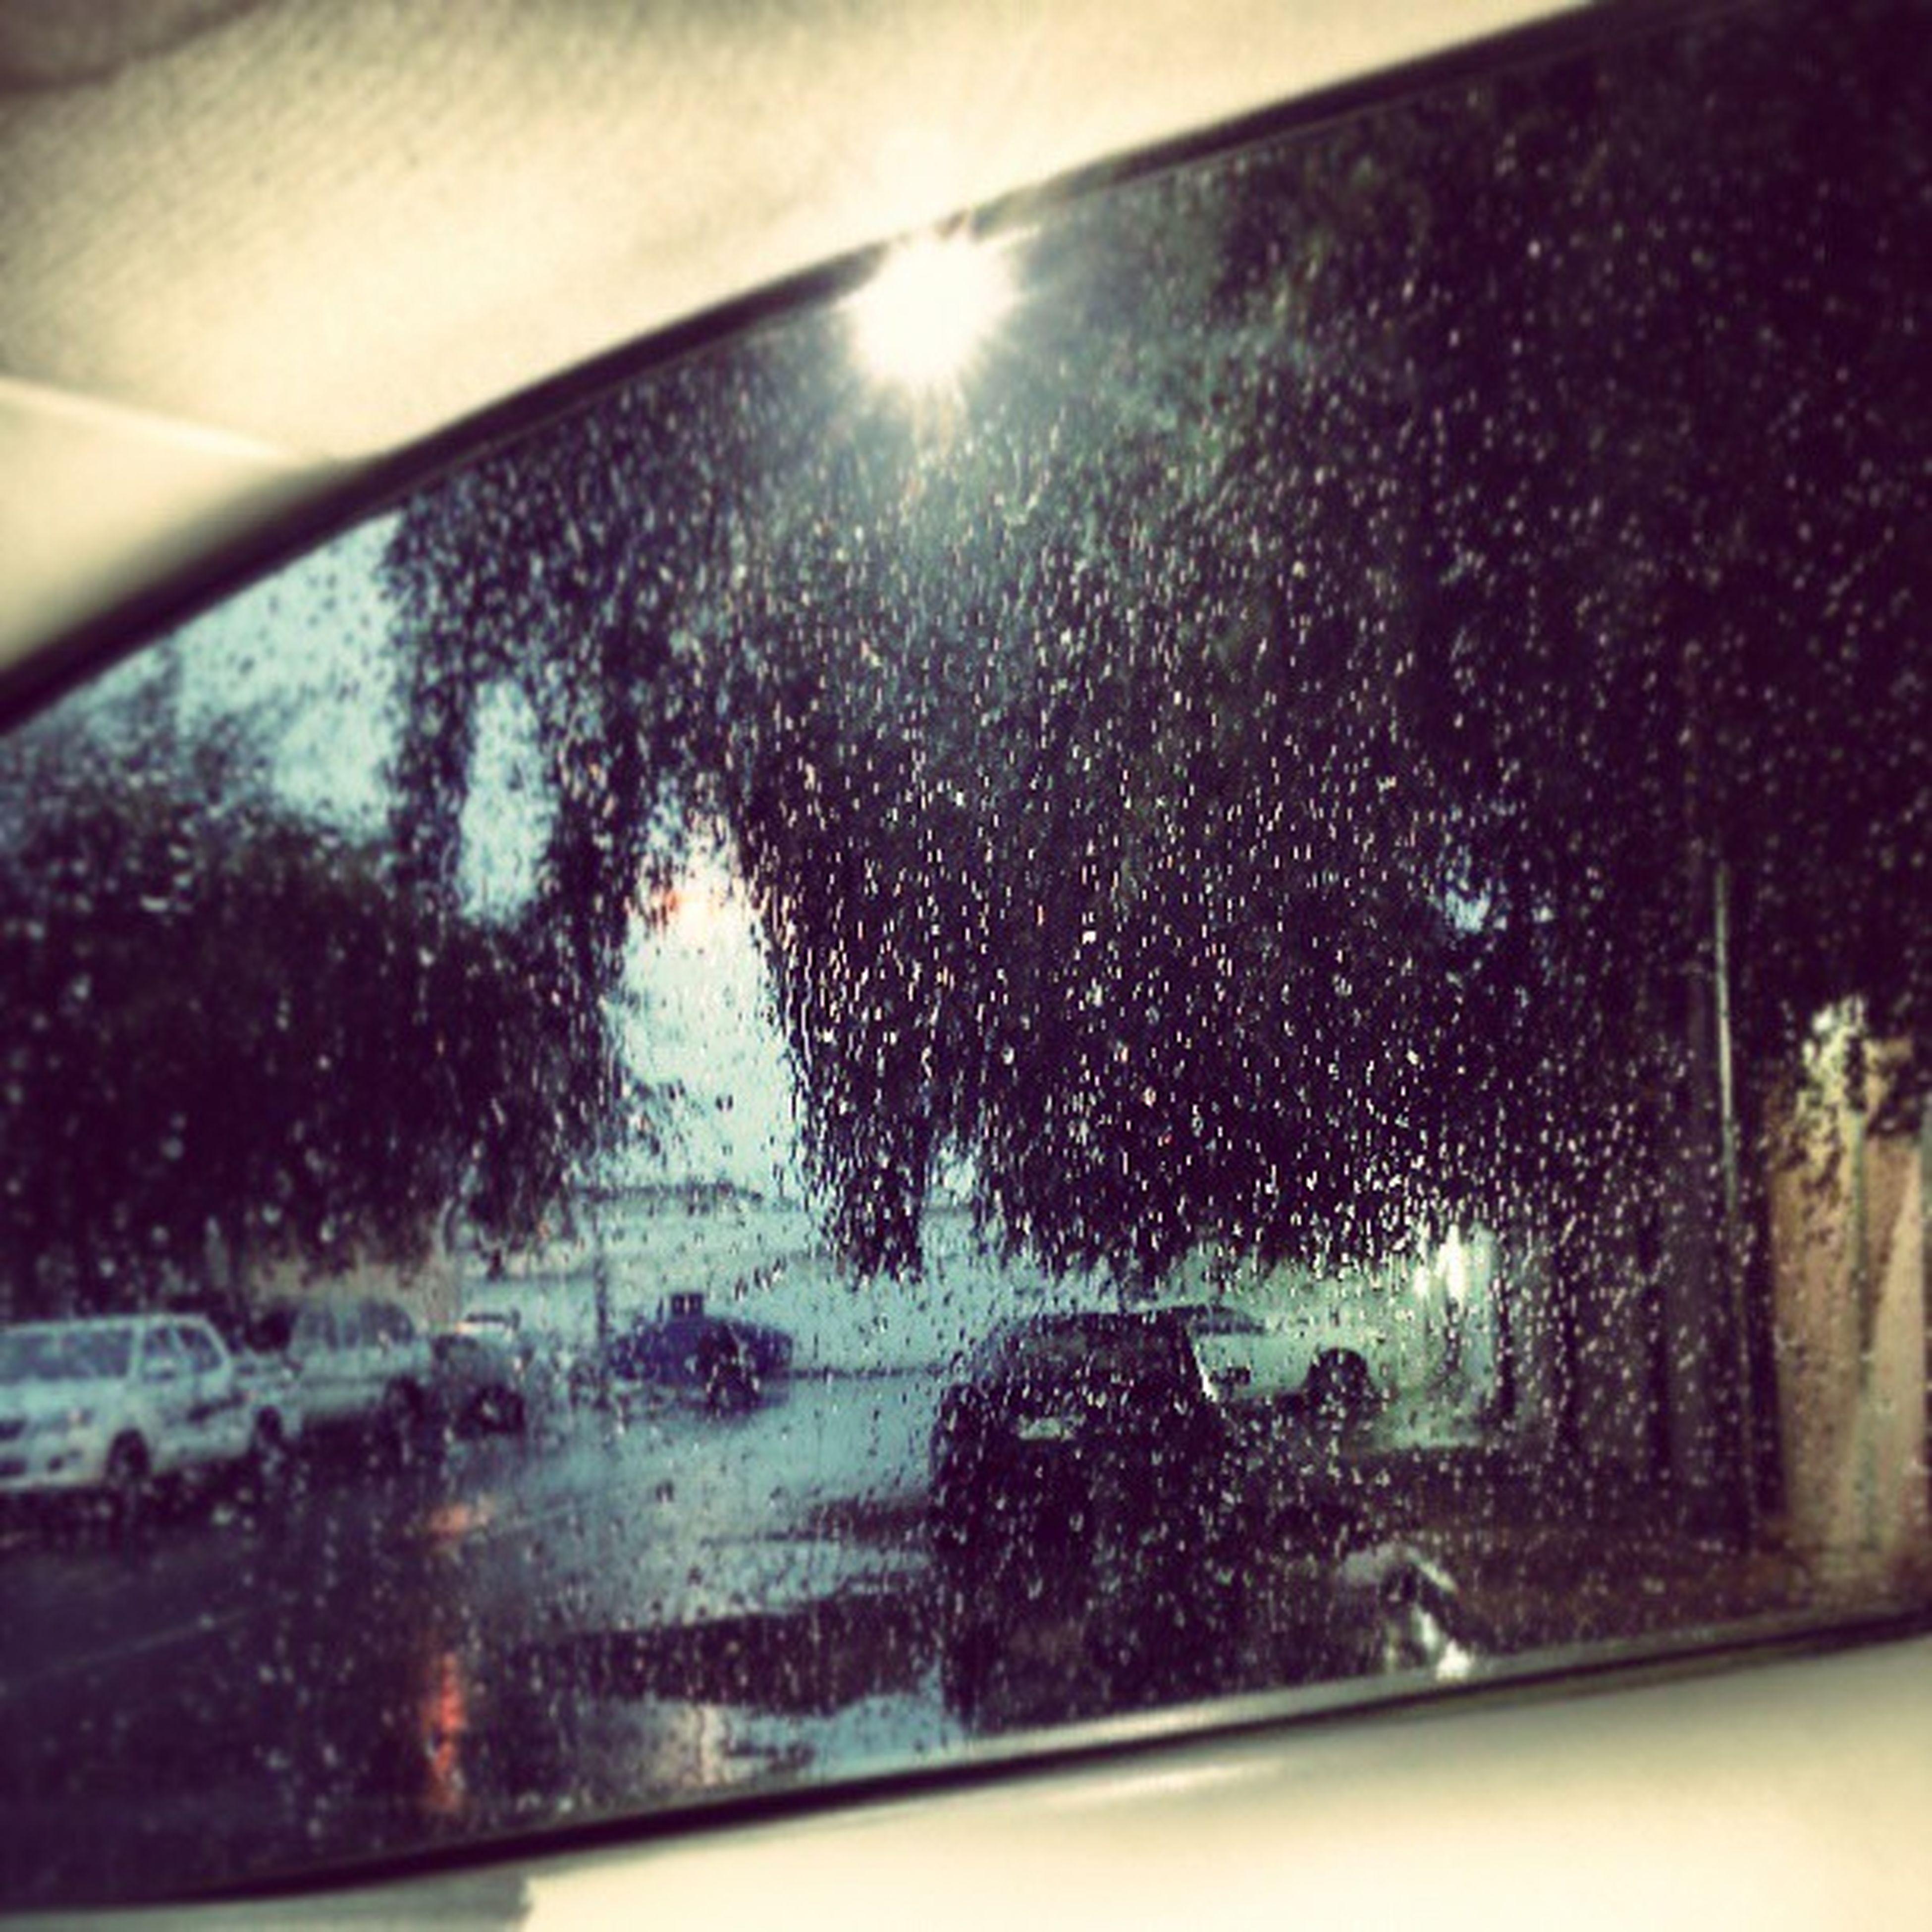 wet, drop, season, window, glass - material, rain, water, transportation, transparent, indoors, car, vehicle interior, raindrop, weather, road, land vehicle, windshield, street, mode of transport, close-up